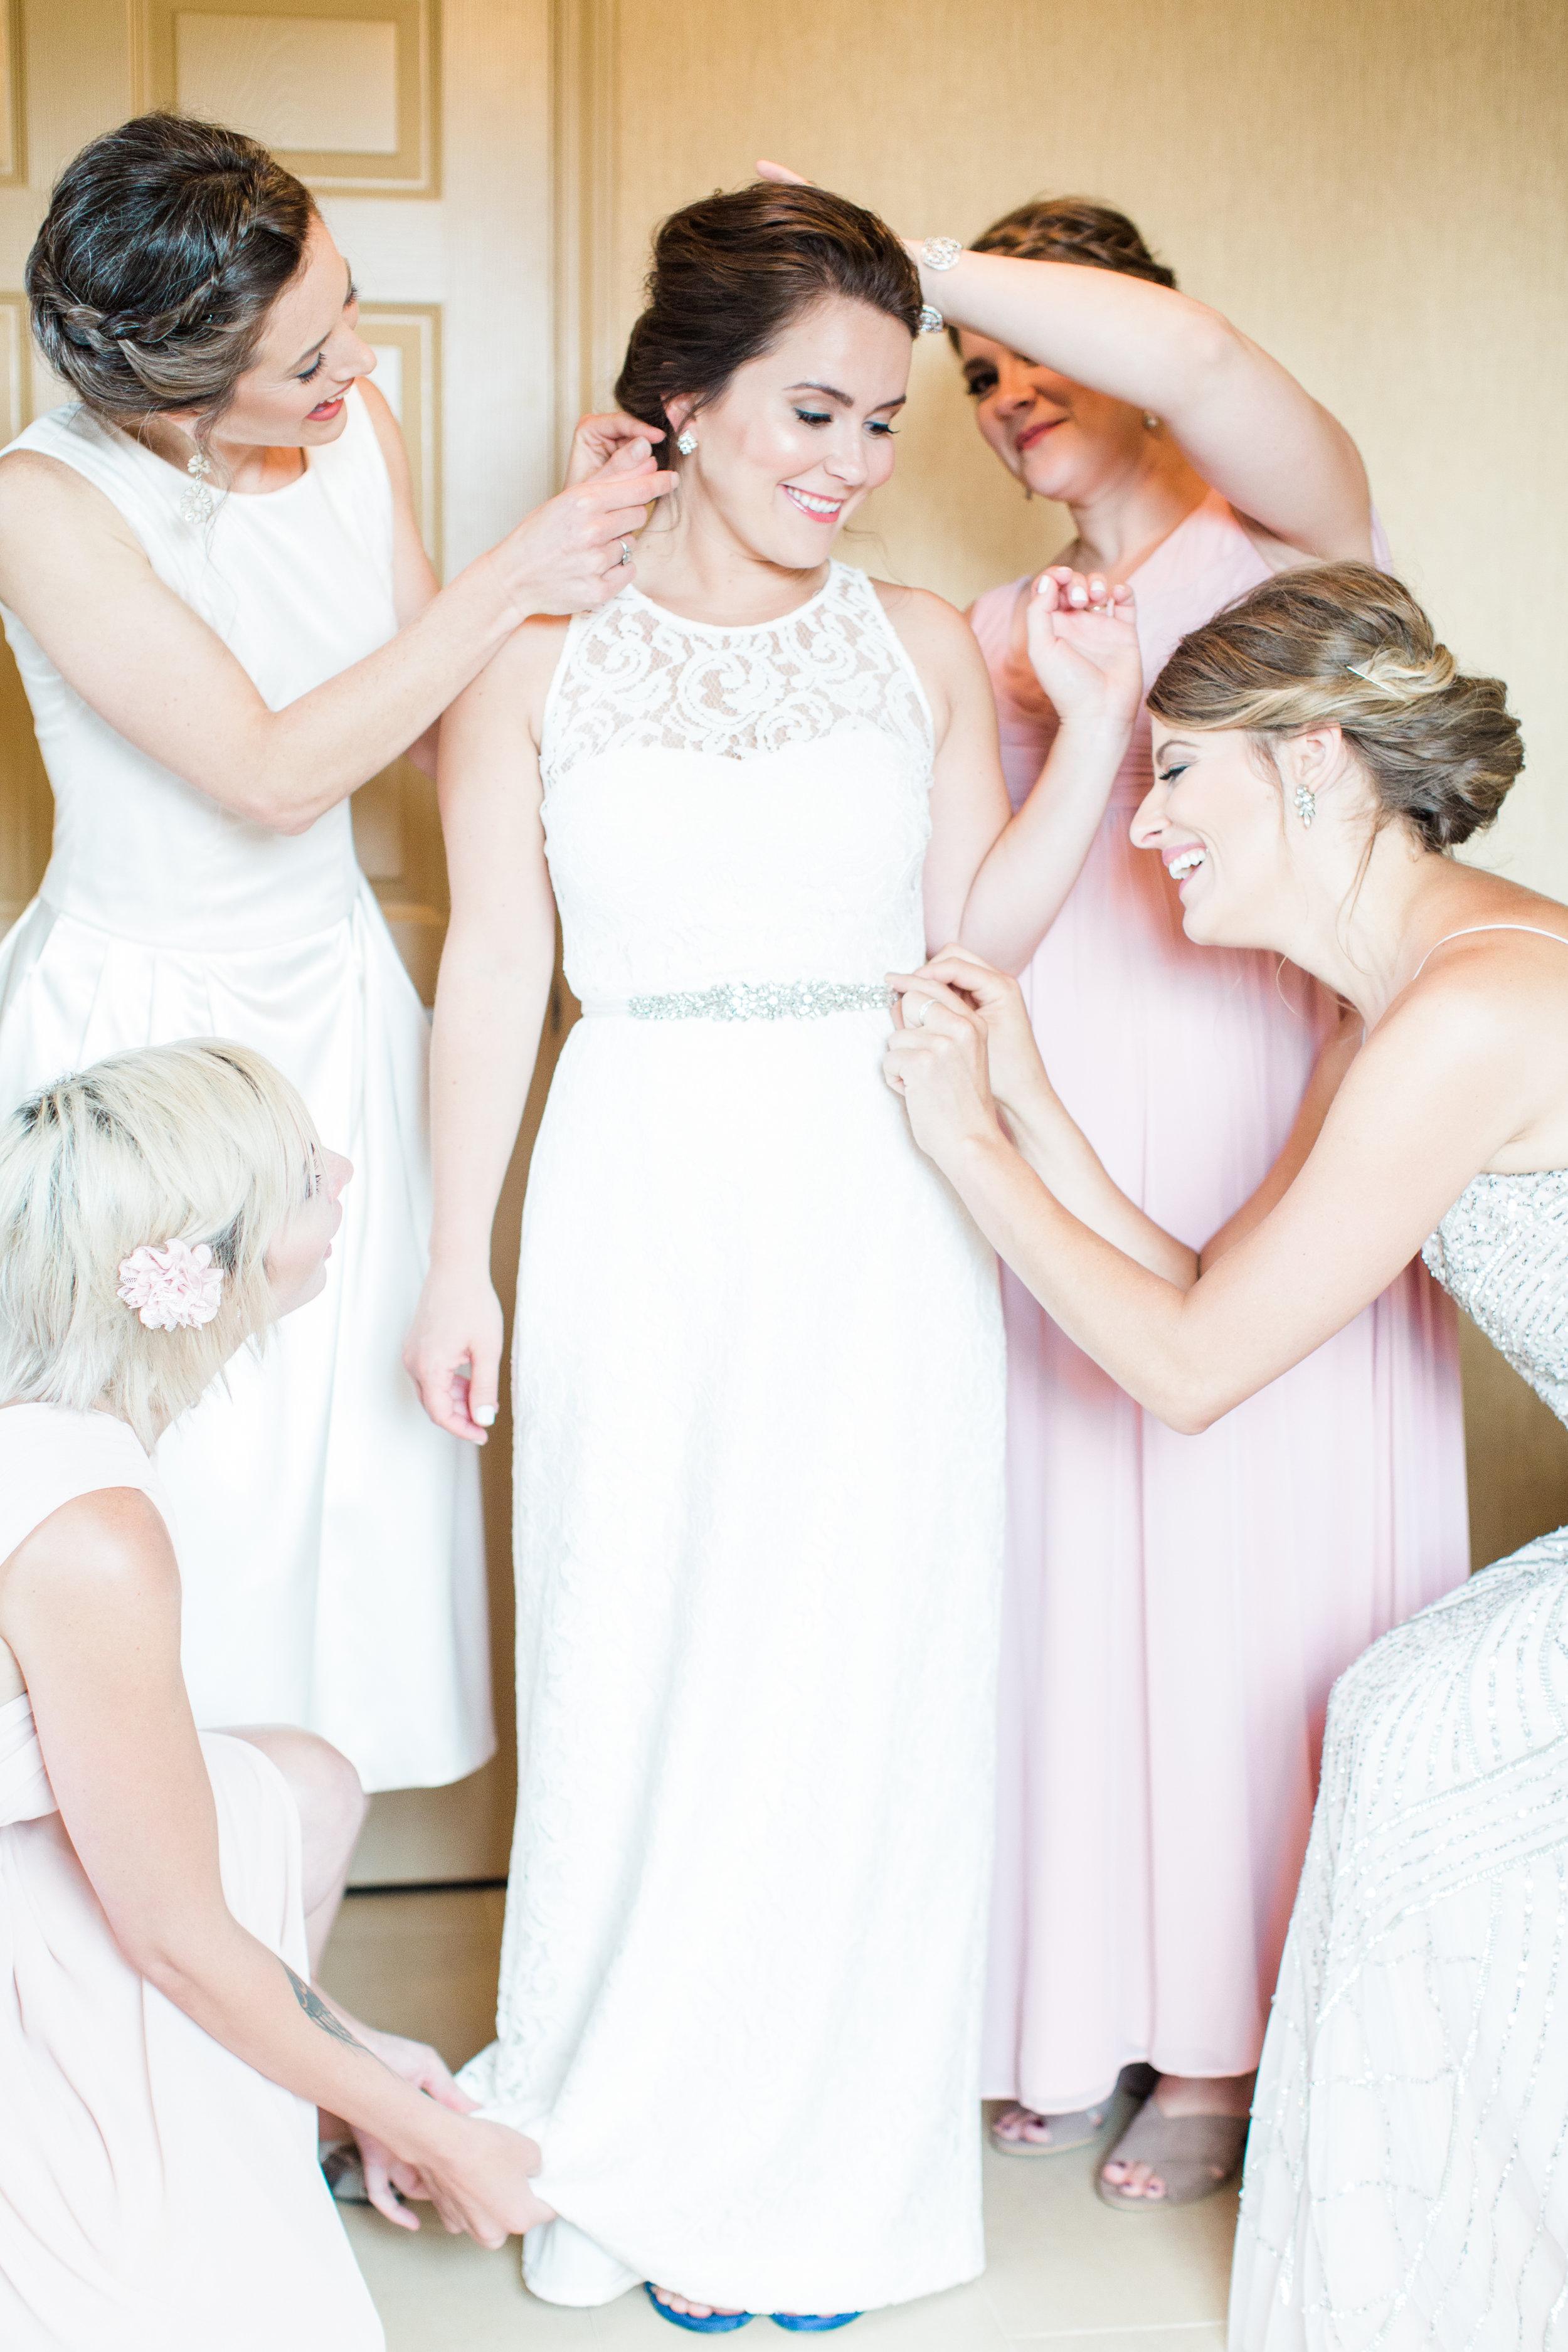 Zoller+Wedding+Getting+Ready-46.jpg